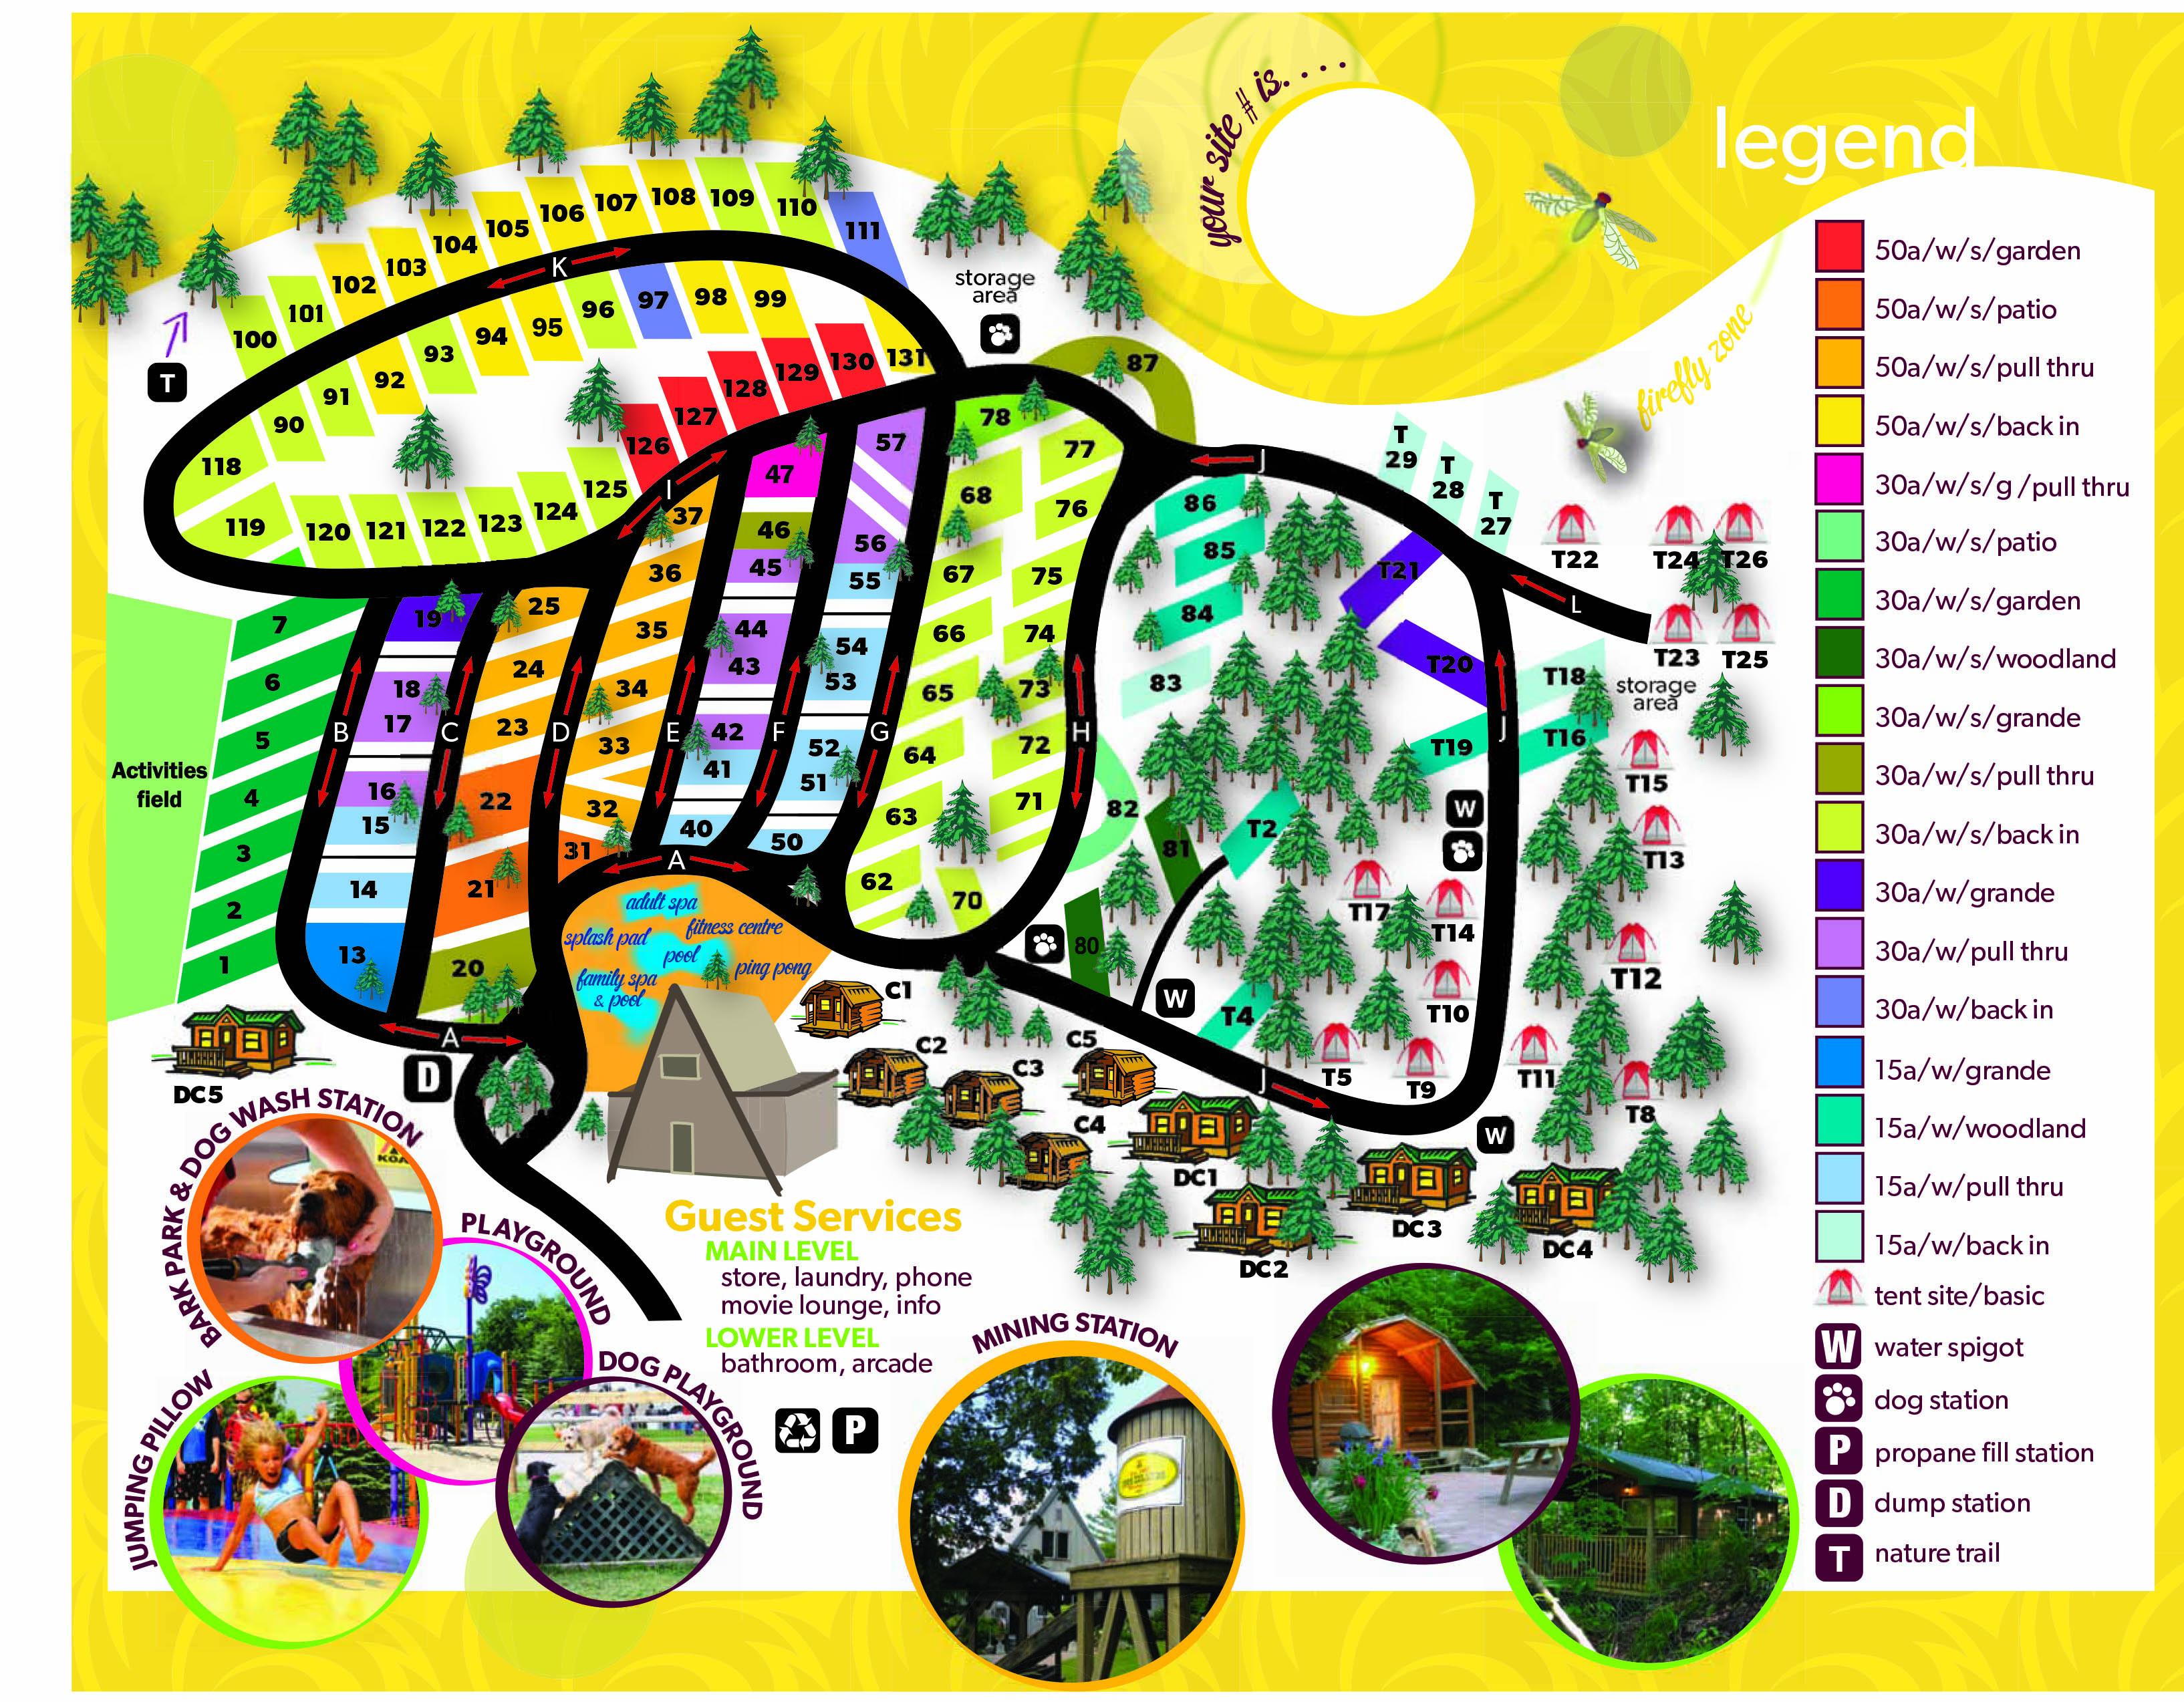 Koa Canada Map Lansdowne, Ontario Campground Map | 1000 Islands / Ivy Lea KOA